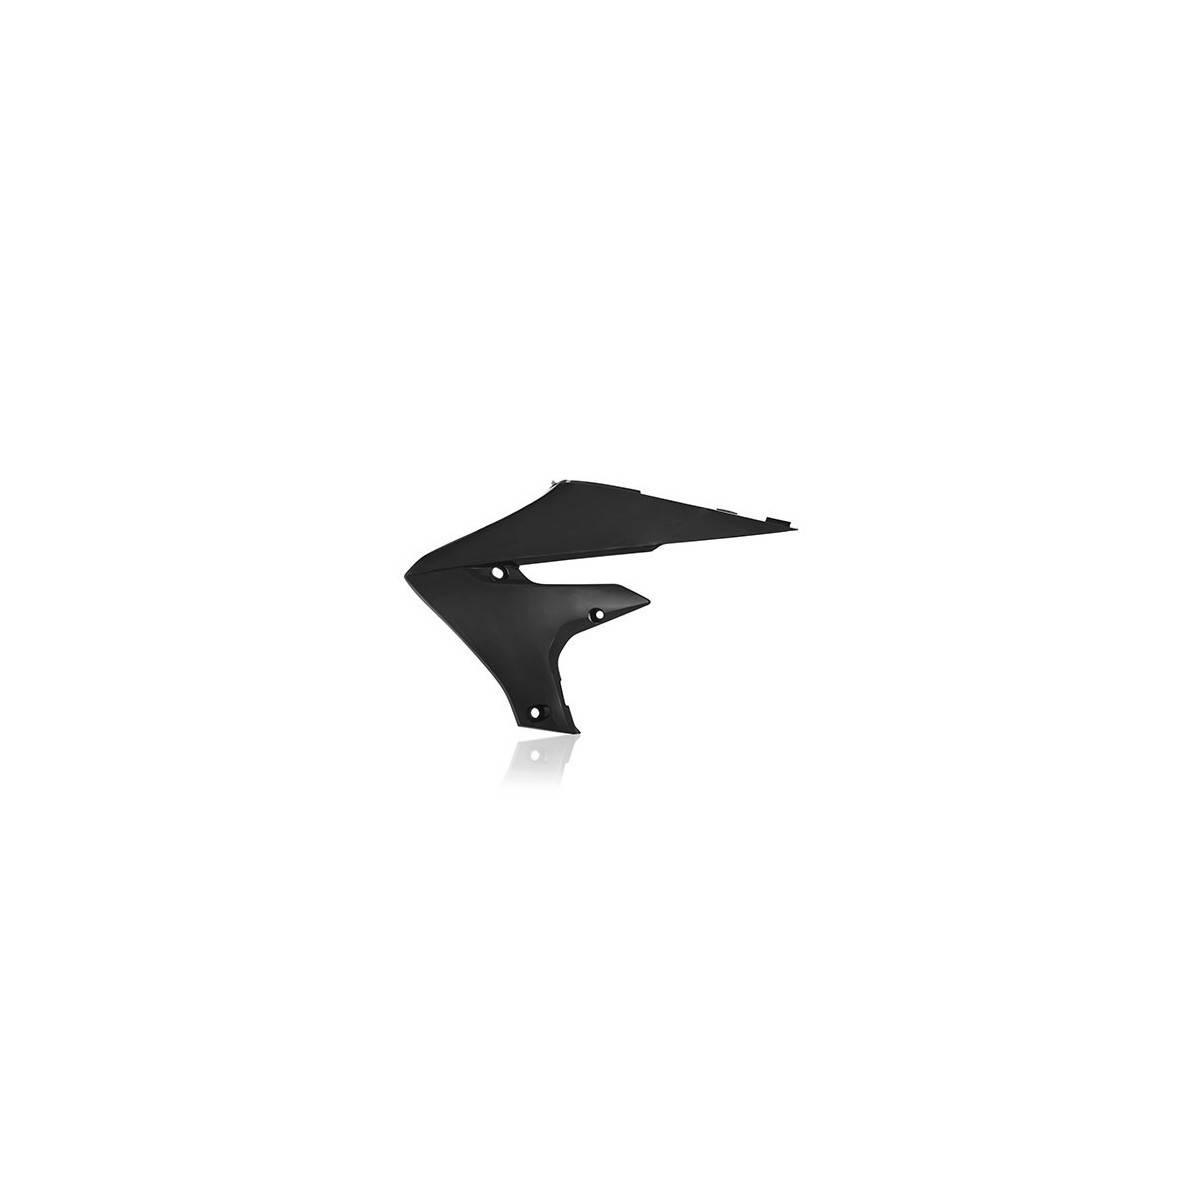 0022956-090 - Cubiertas Inferiores Radiador Yamaha Yzf450 14 17 Negro